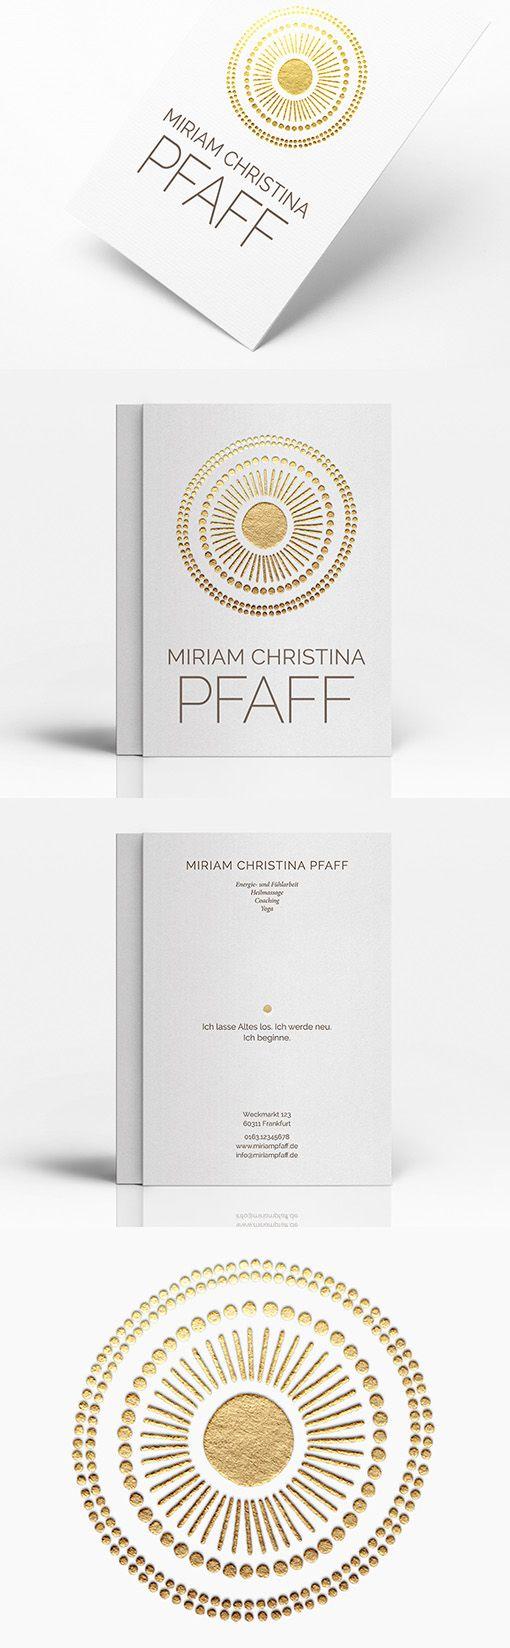 Stylish Gold Letterpress Scandinavian Design Business Card For A Yoga Instructor